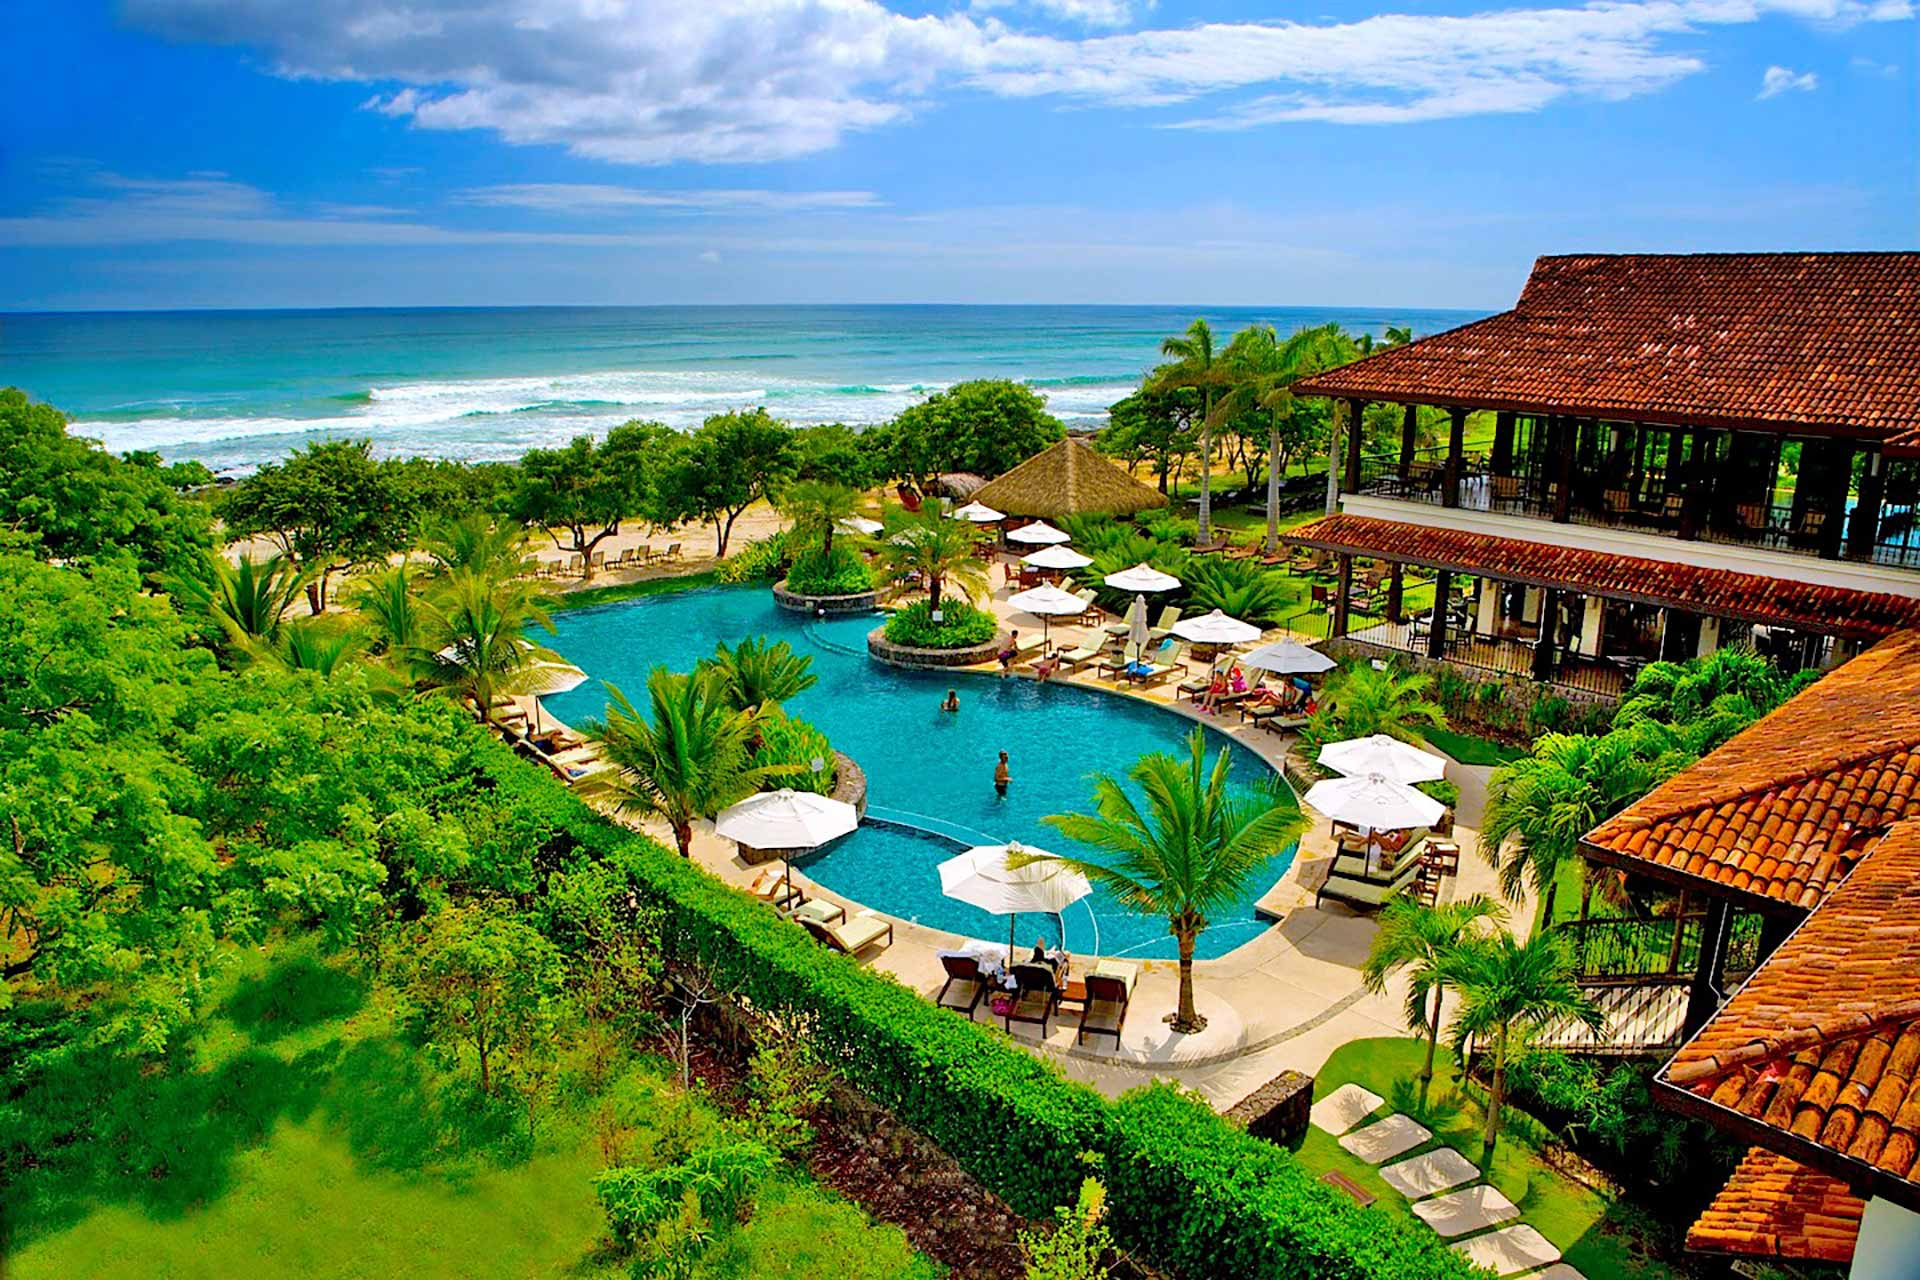 The famous Hacienda Pinilla Beach Club